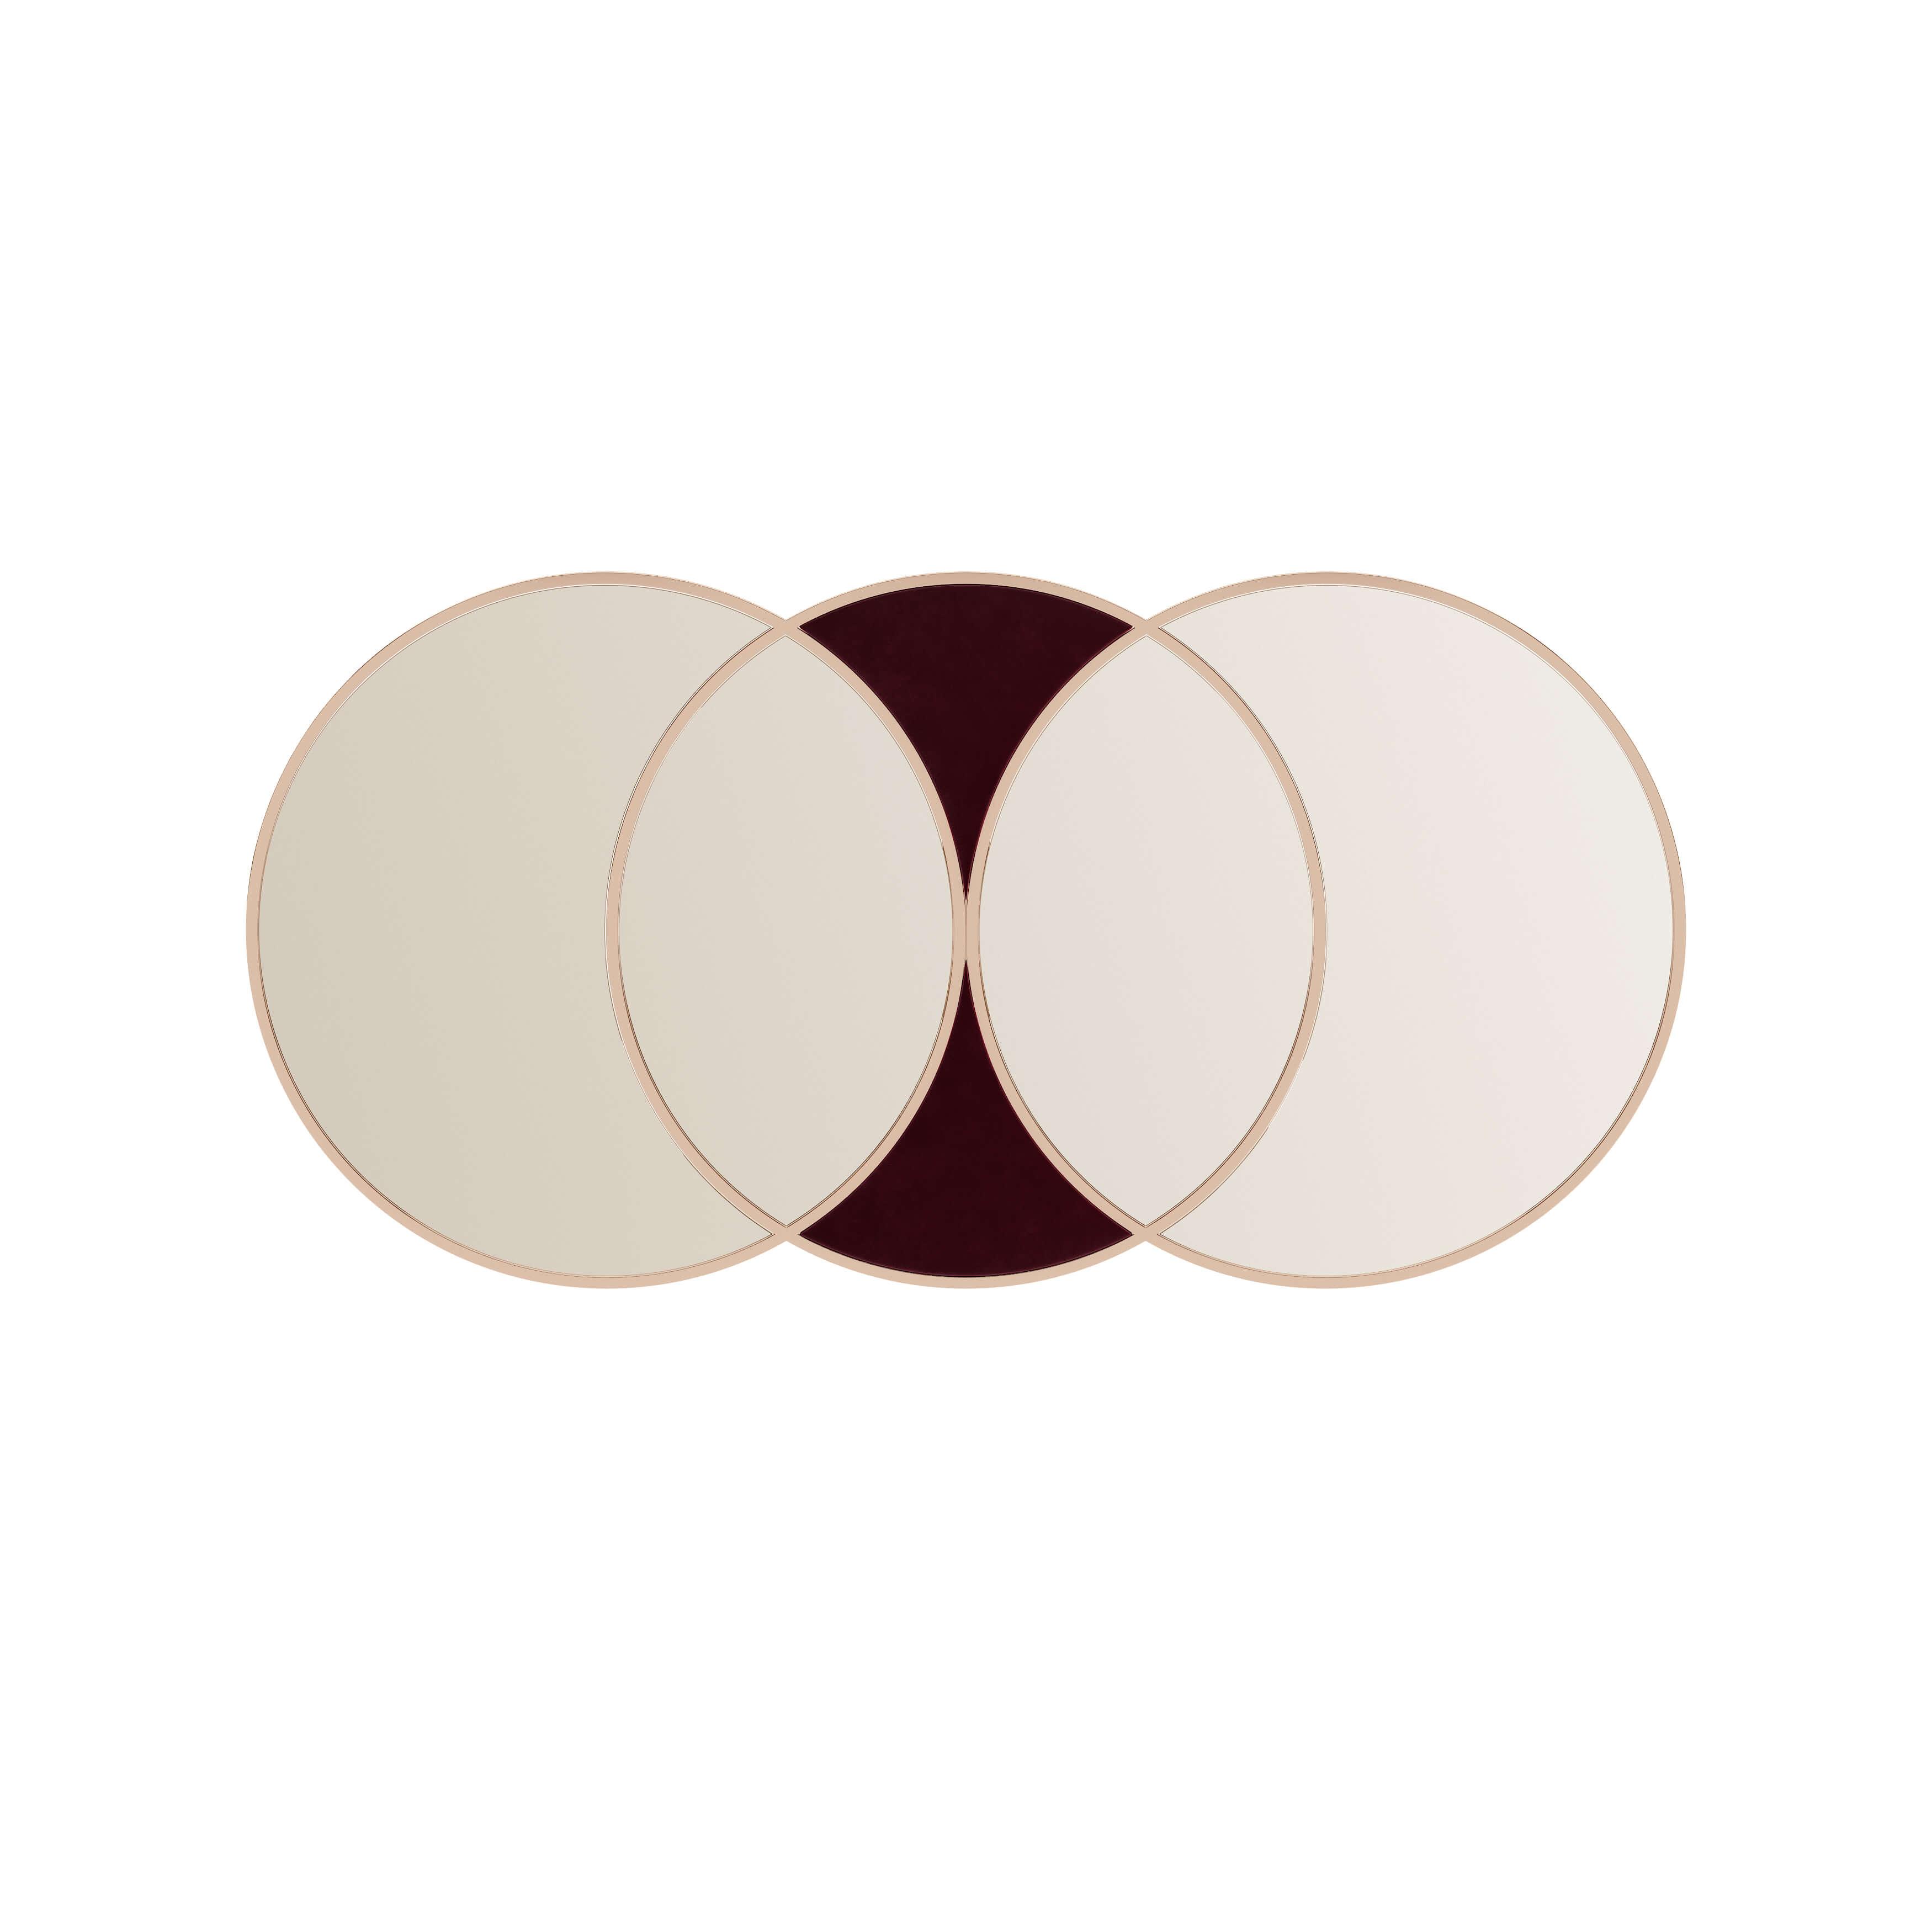 red-fever-sienna-mirror-upholstered-furniture-interior-design-home-decor-domkapa